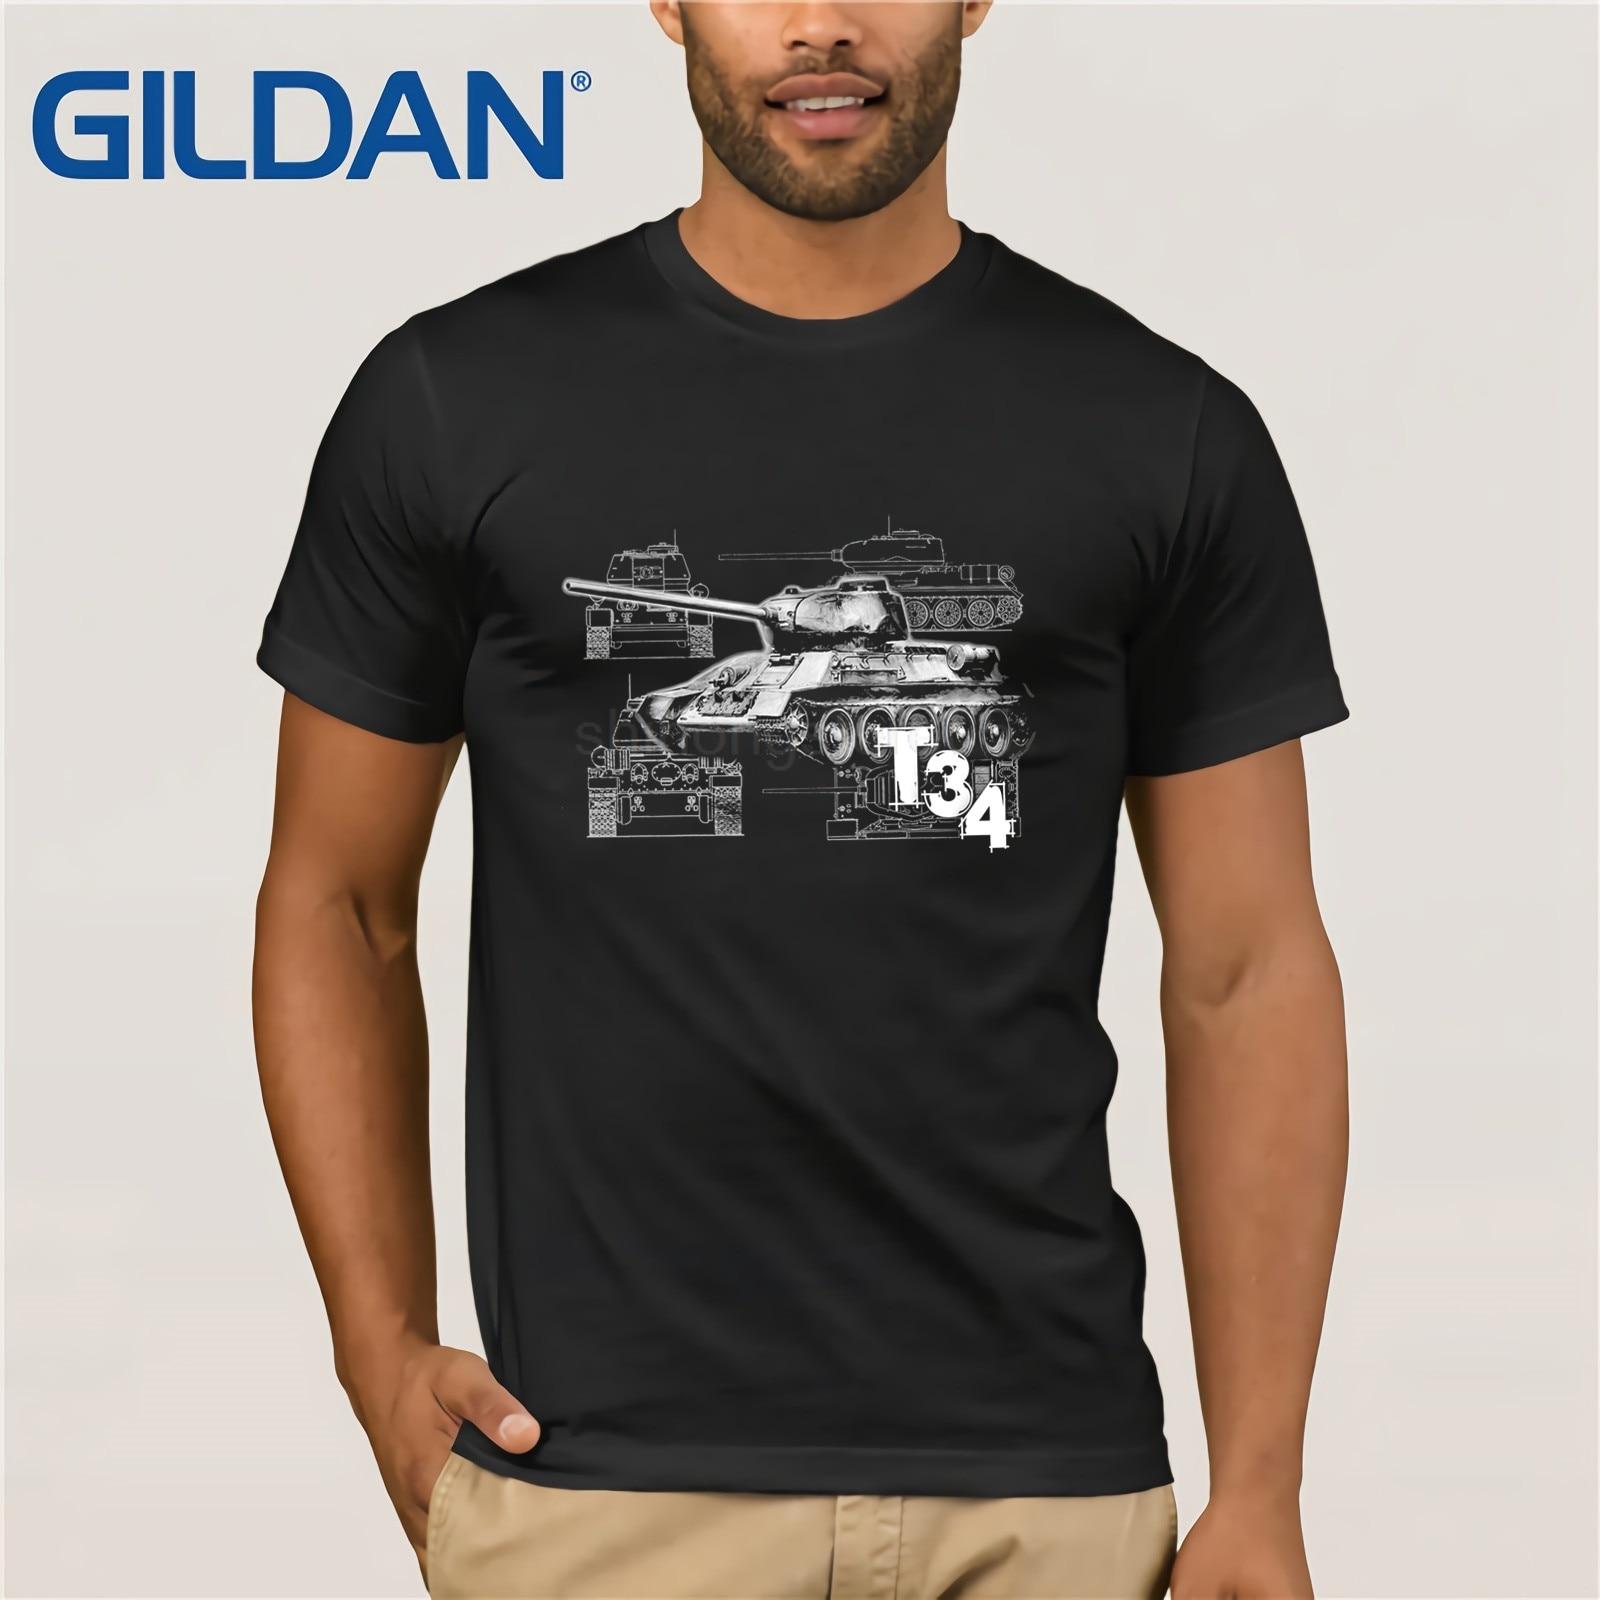 2020 New Mens T Shirts Shirt t-shirt Tiger Tank T34 Army Russia Soldiers Military Fun Print Round Neck Man